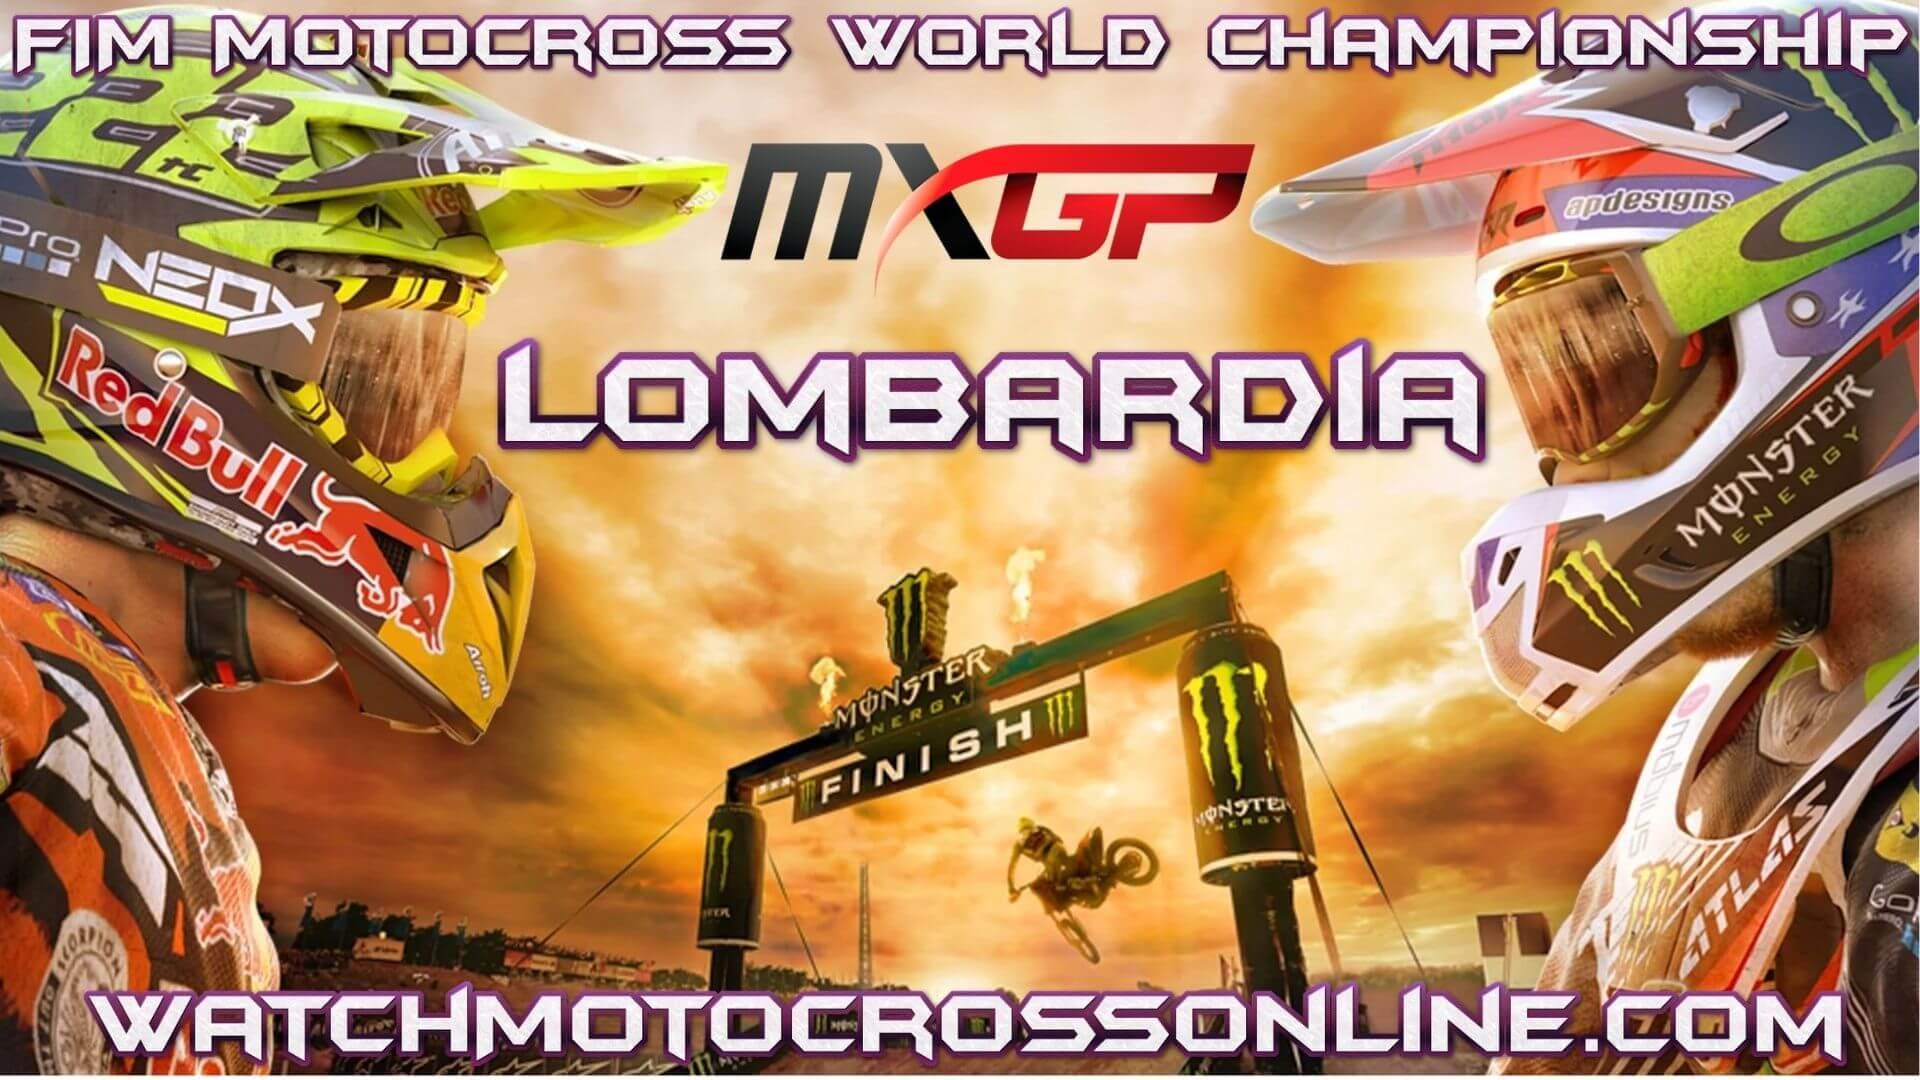 MXGP Of Lombardia Live Stream 2020